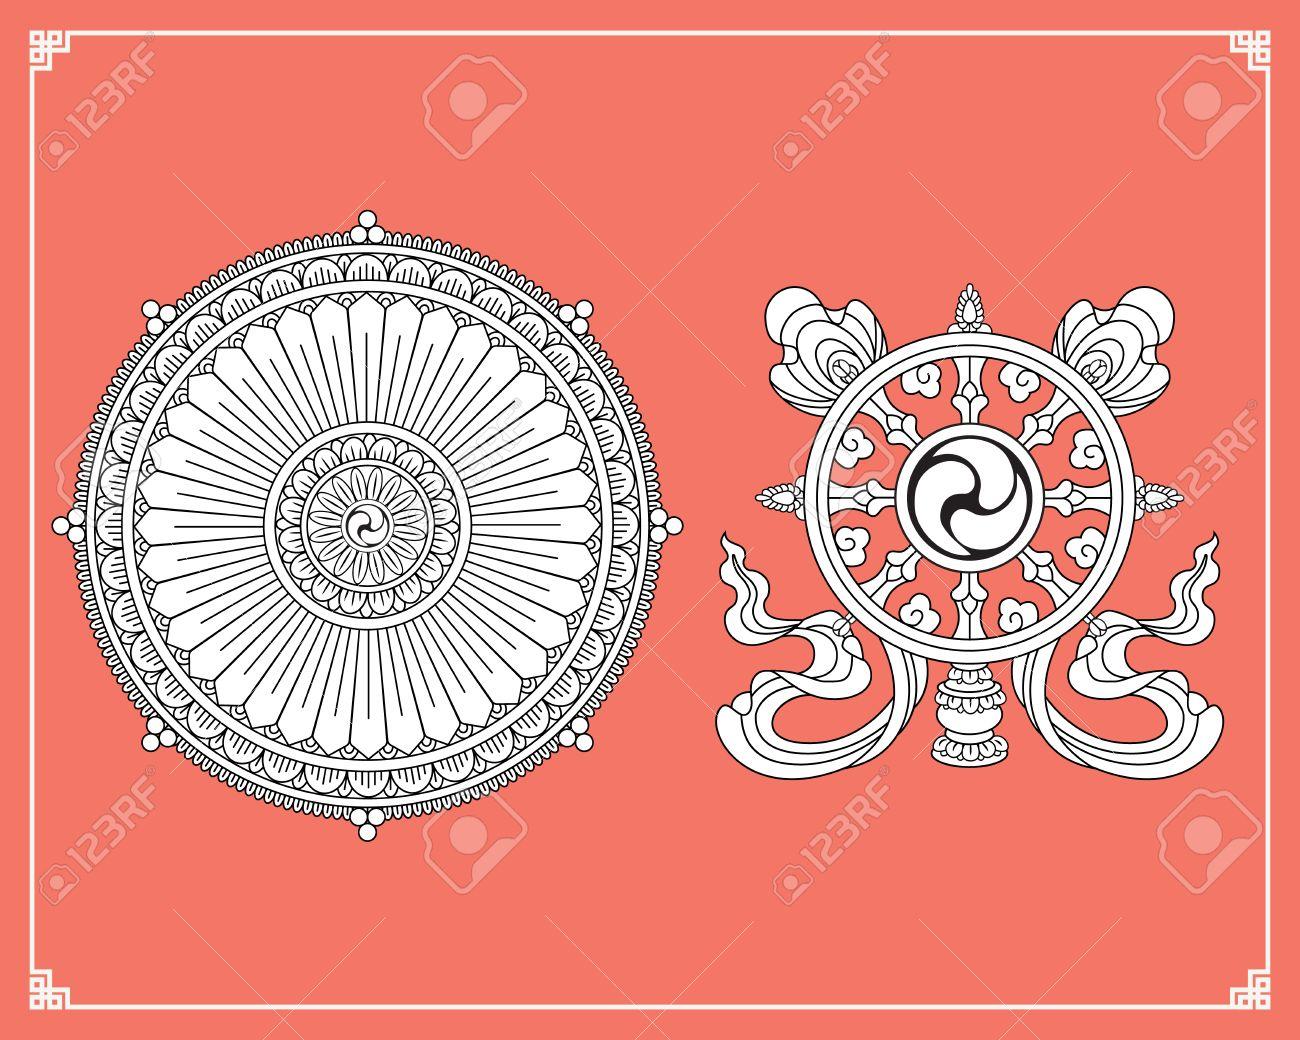 Dharma wheel dharmachakra icons wheel of dharma in black and dharma wheel dharmachakra icons wheel of dharma in black and white design buddhism biocorpaavc Gallery